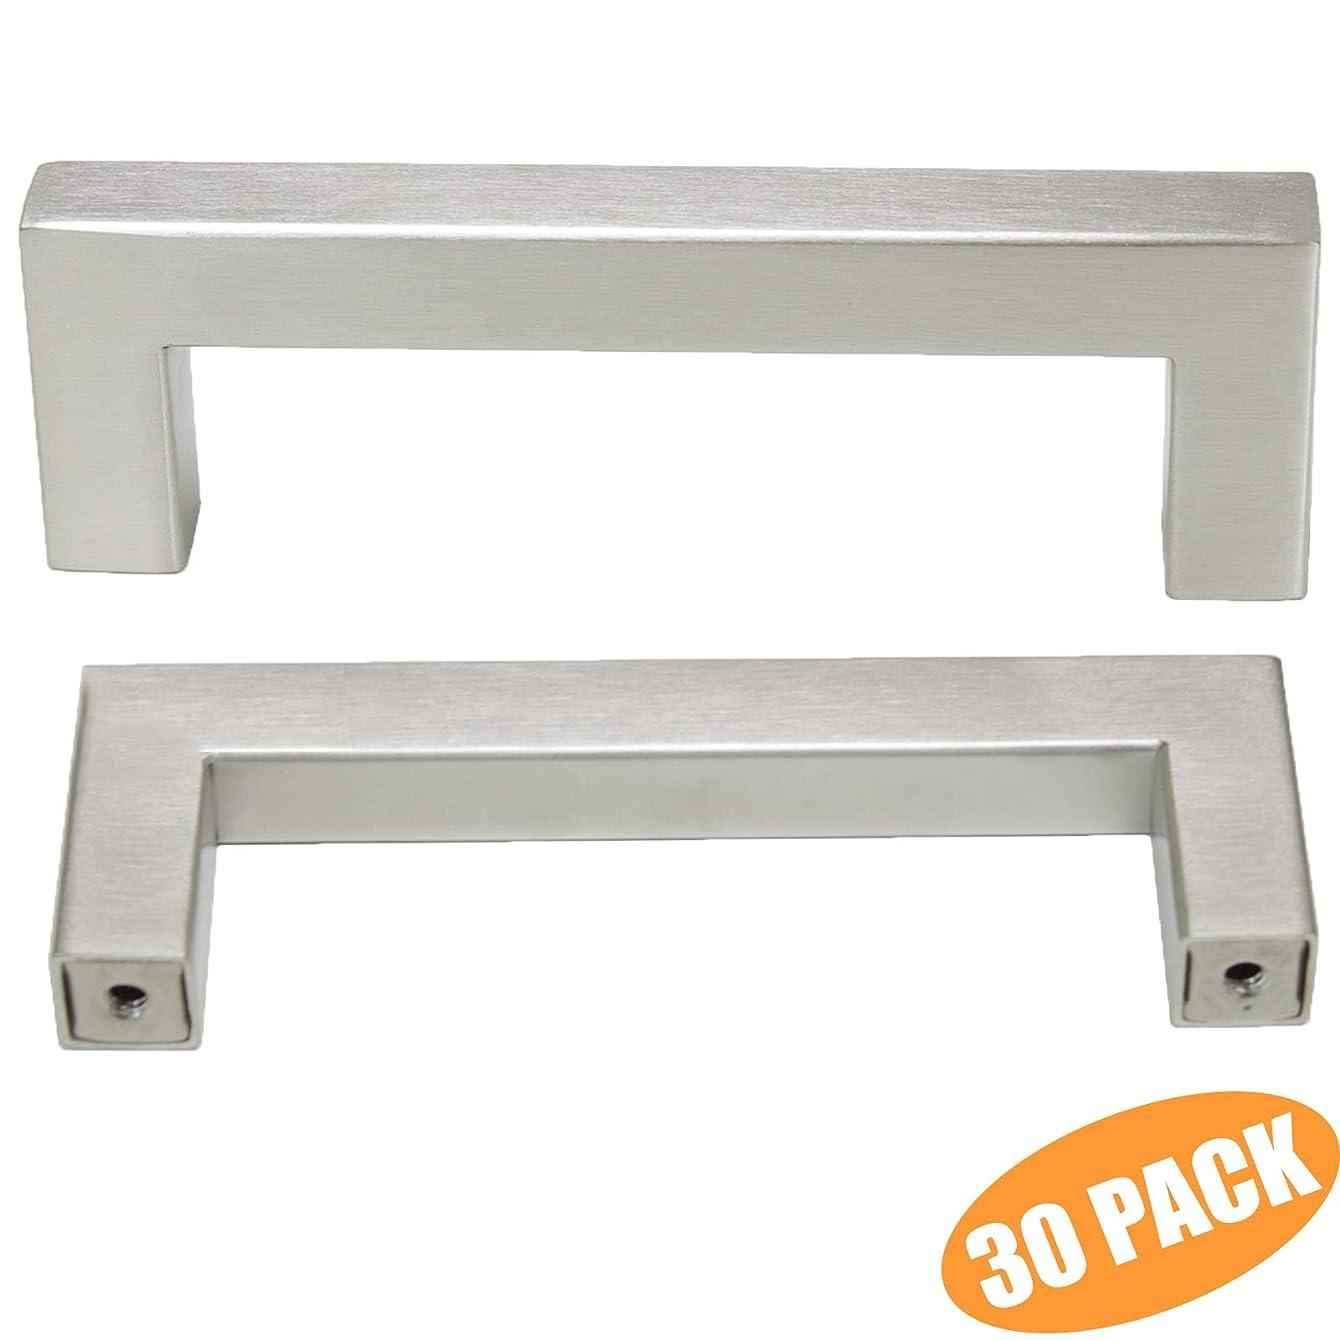 Probrico 30 Pack Cabinet Pulls Handles Knobs Kitchen Furniture Hardware Brusehd Nickel, Square T Bar Satinless Steel Handle, 3-3/4